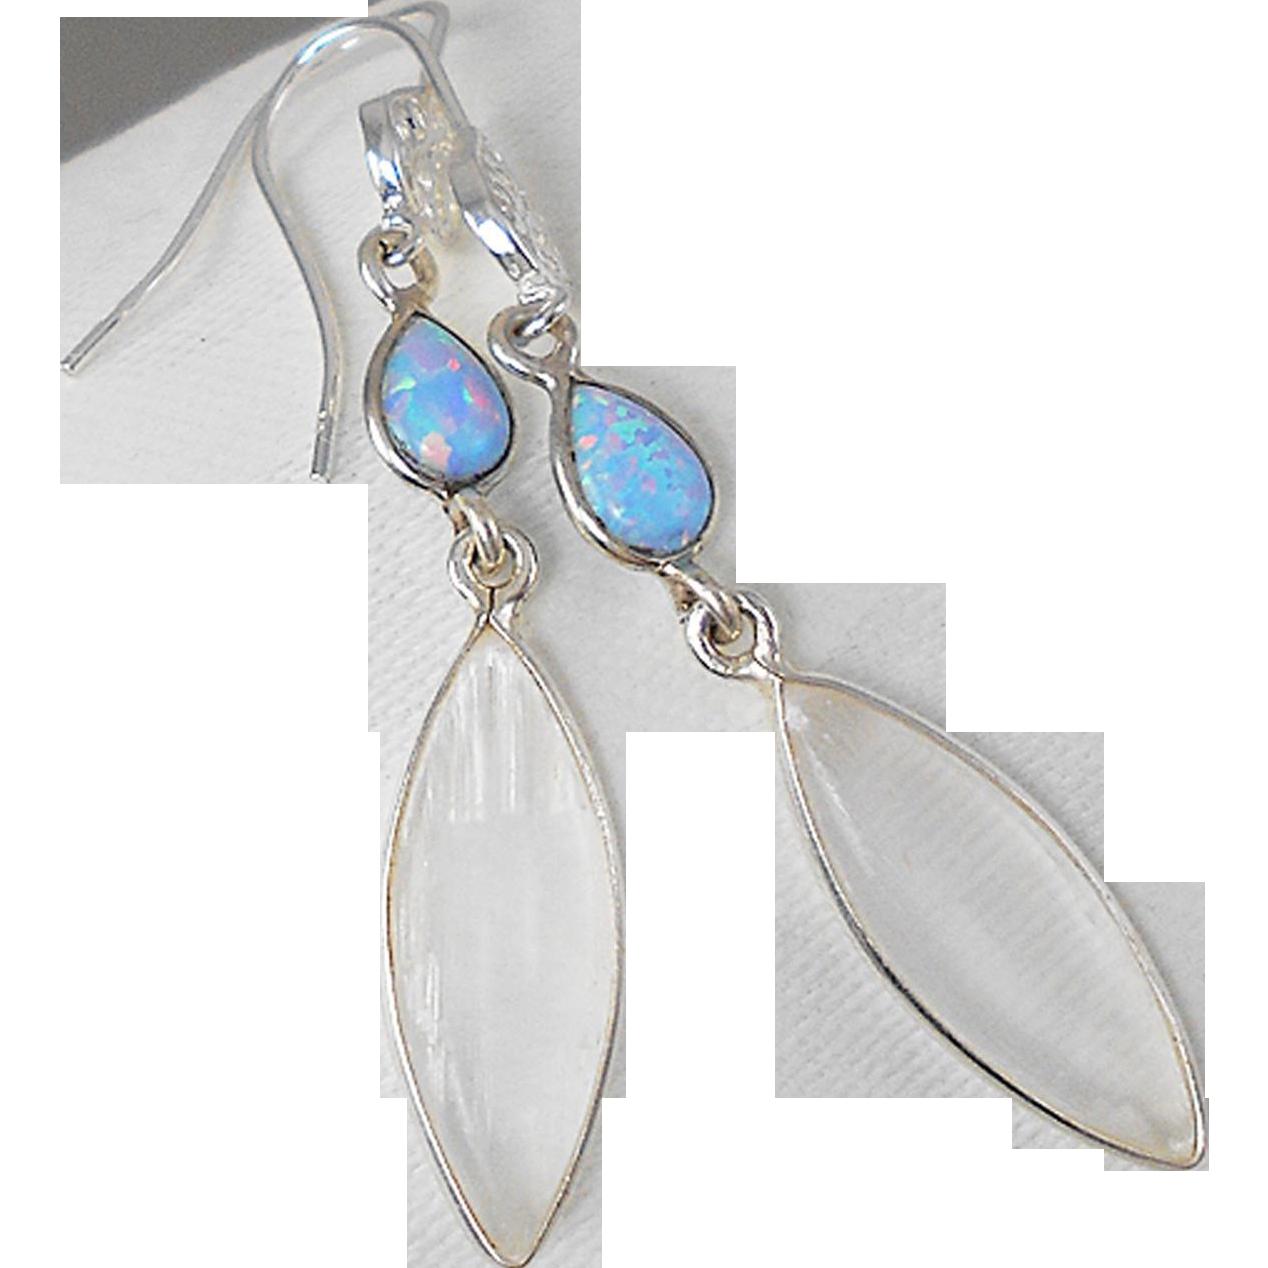 Selenite and Opal Filigree Sterling Silver Earrings